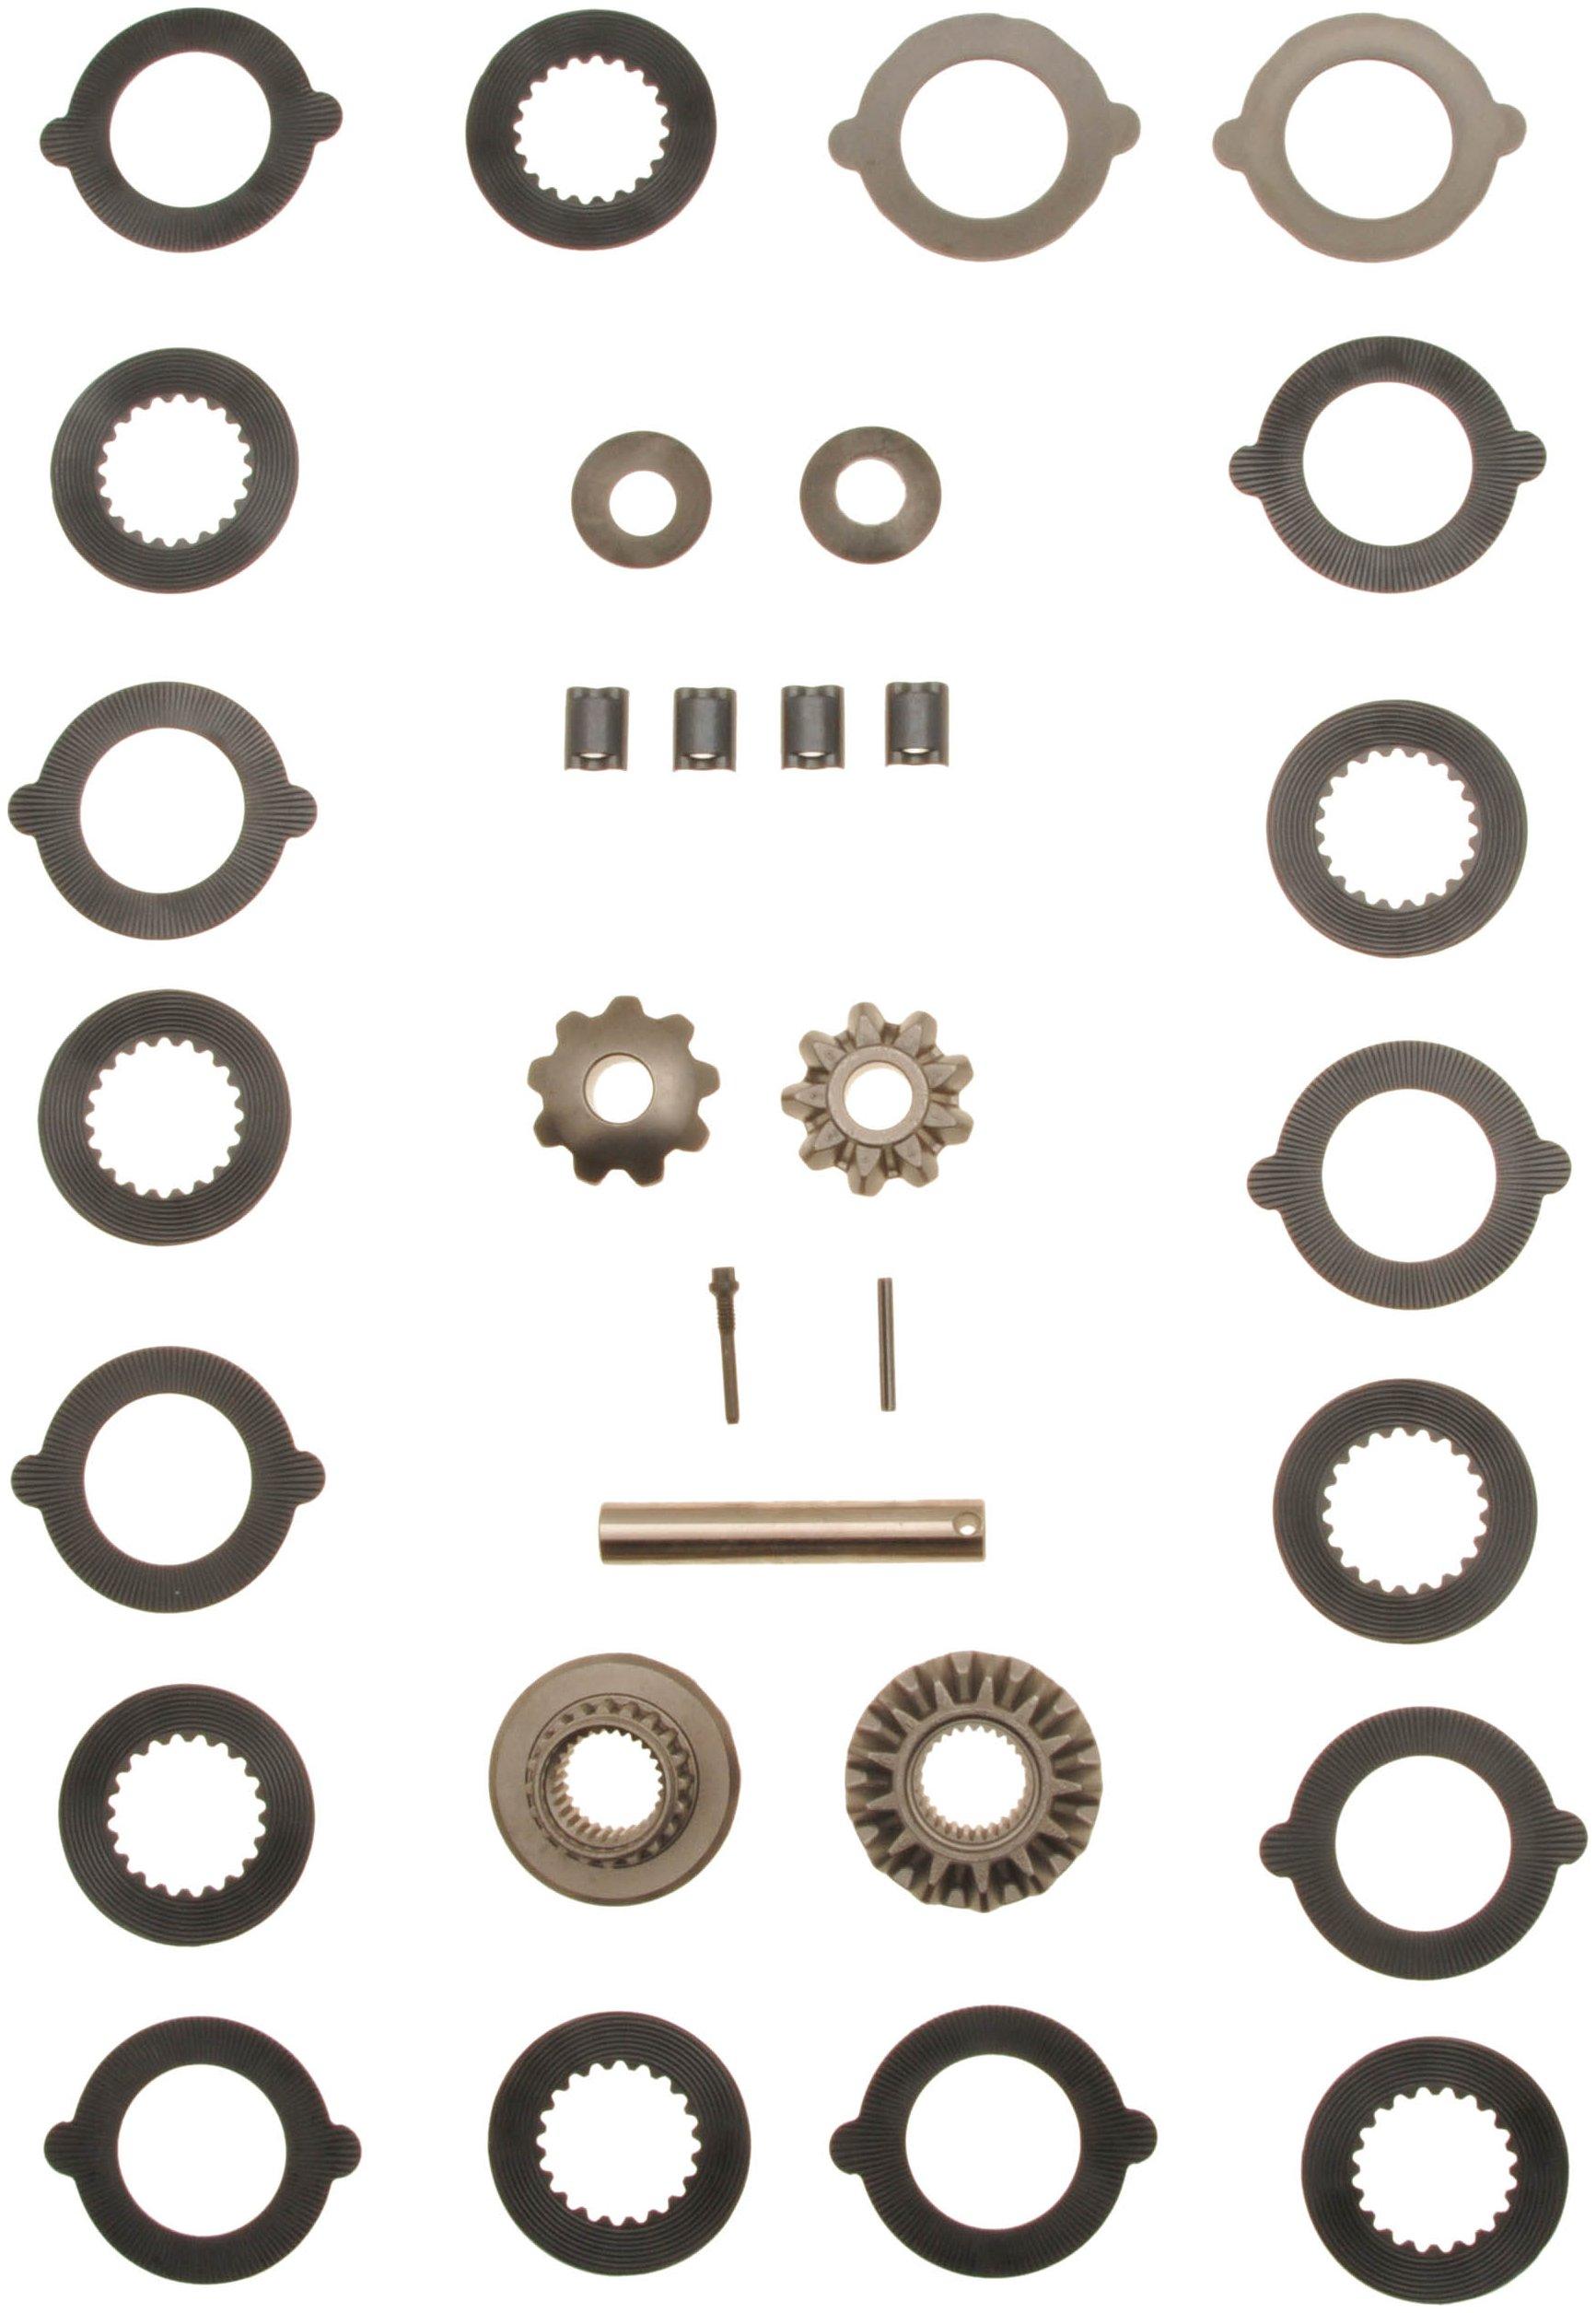 Spicer 708184 Differential Inner Gear Kit